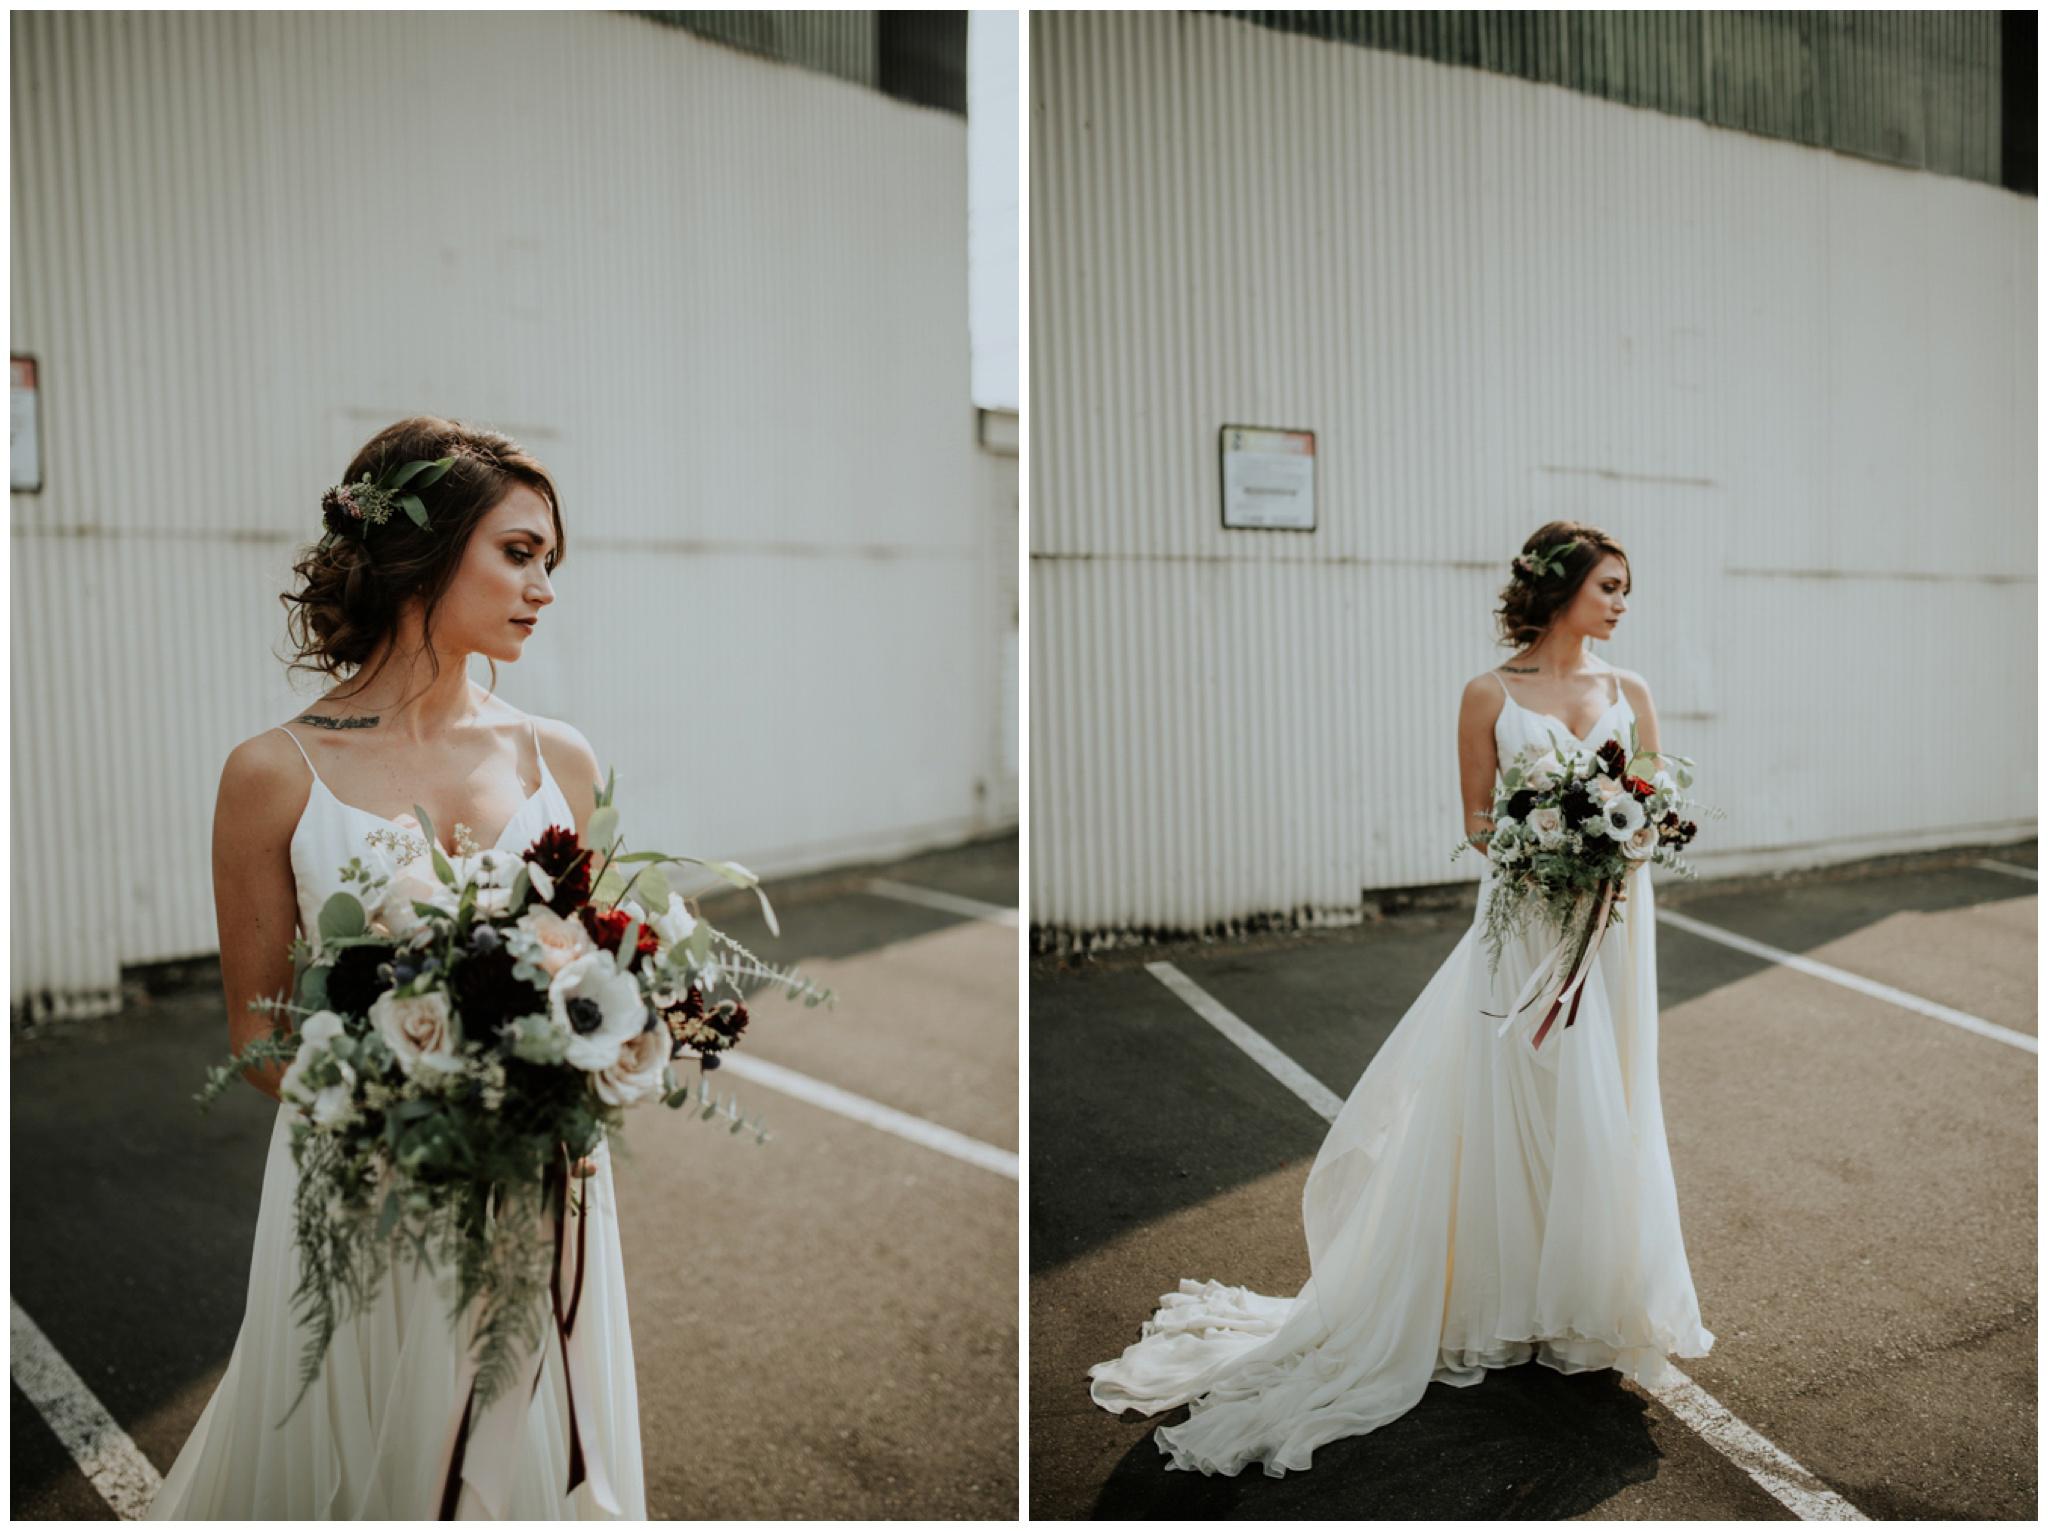 alyssa-keiran-westland-distillery-urban-seattle-wedding-photographer-caitlyn-nikula-88.jpg